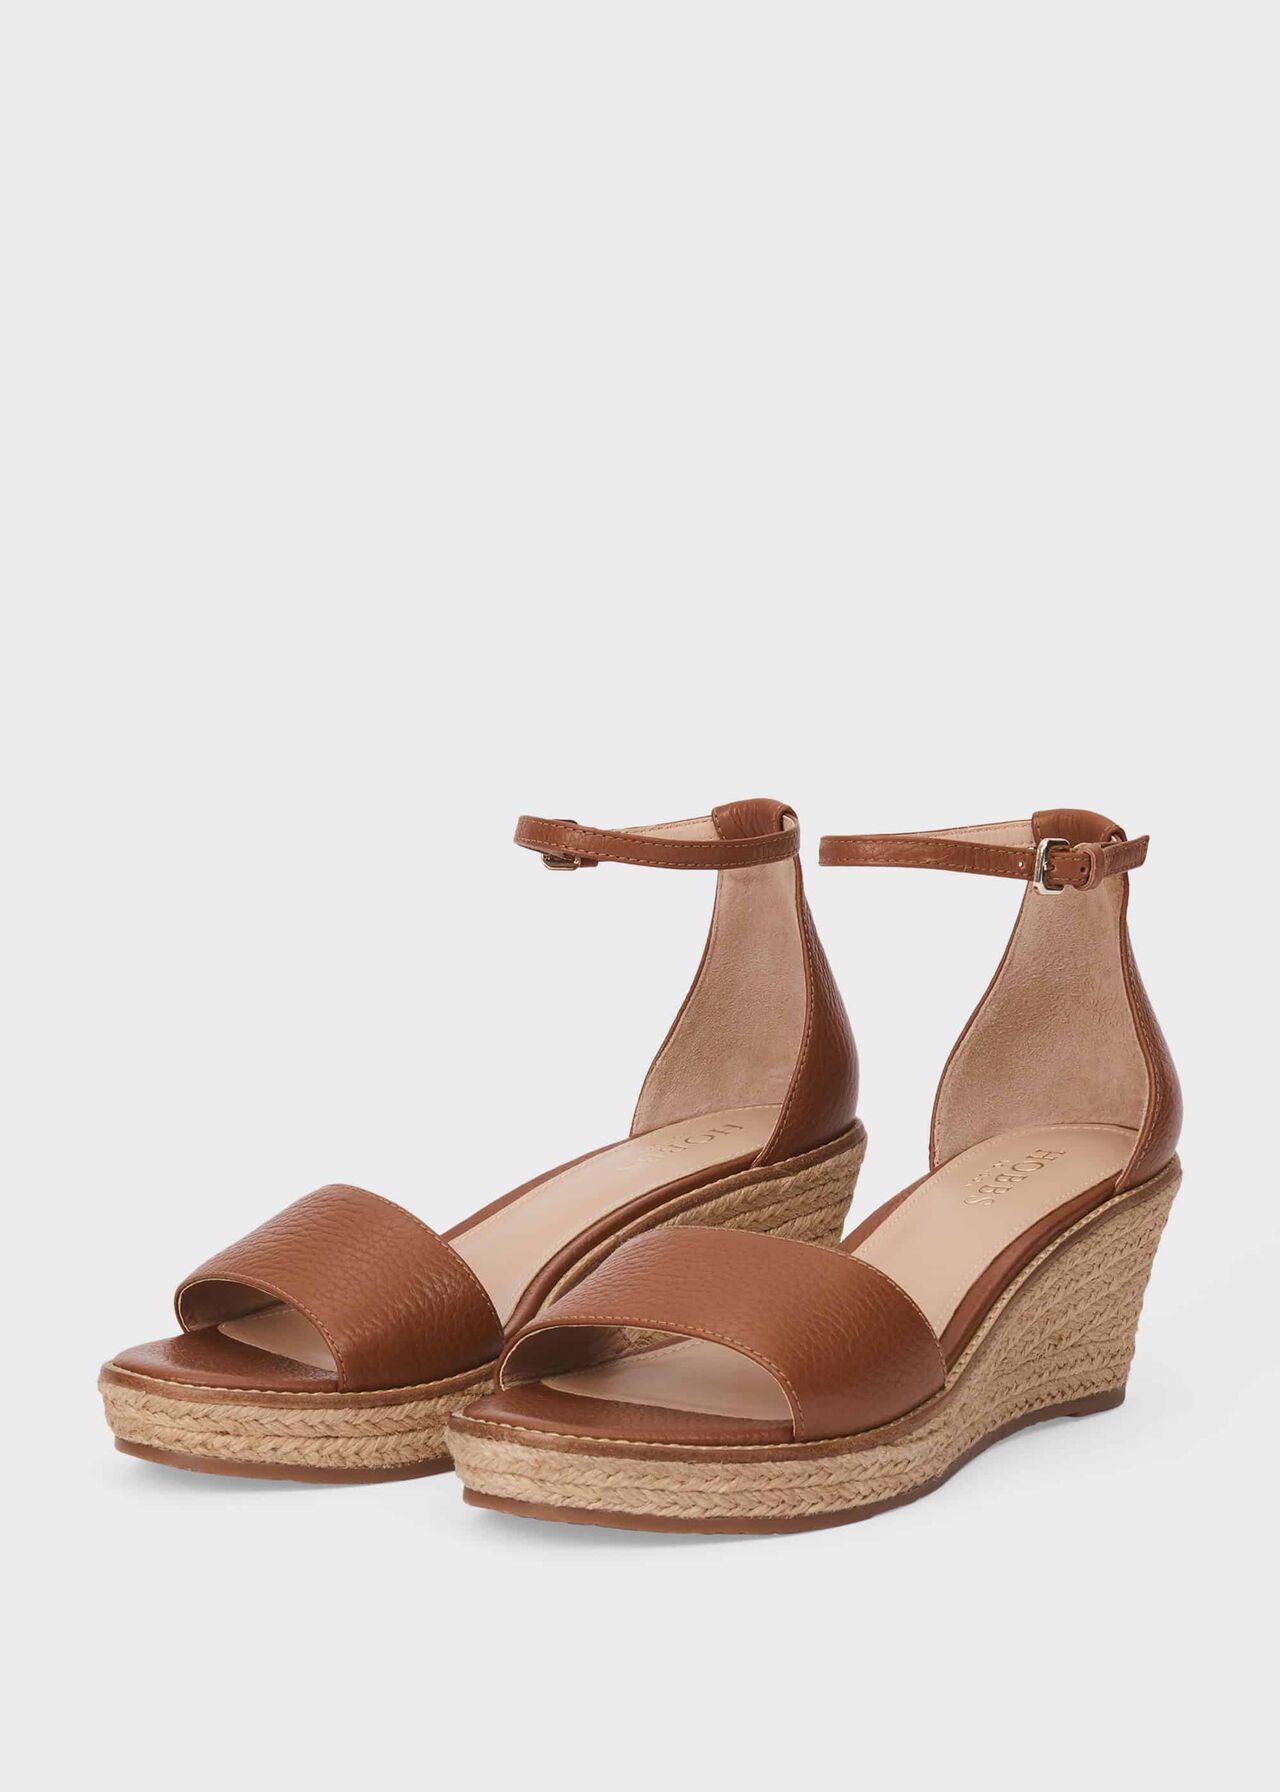 Vespa Leather Wedge Espadrilles, Tan, hi-res